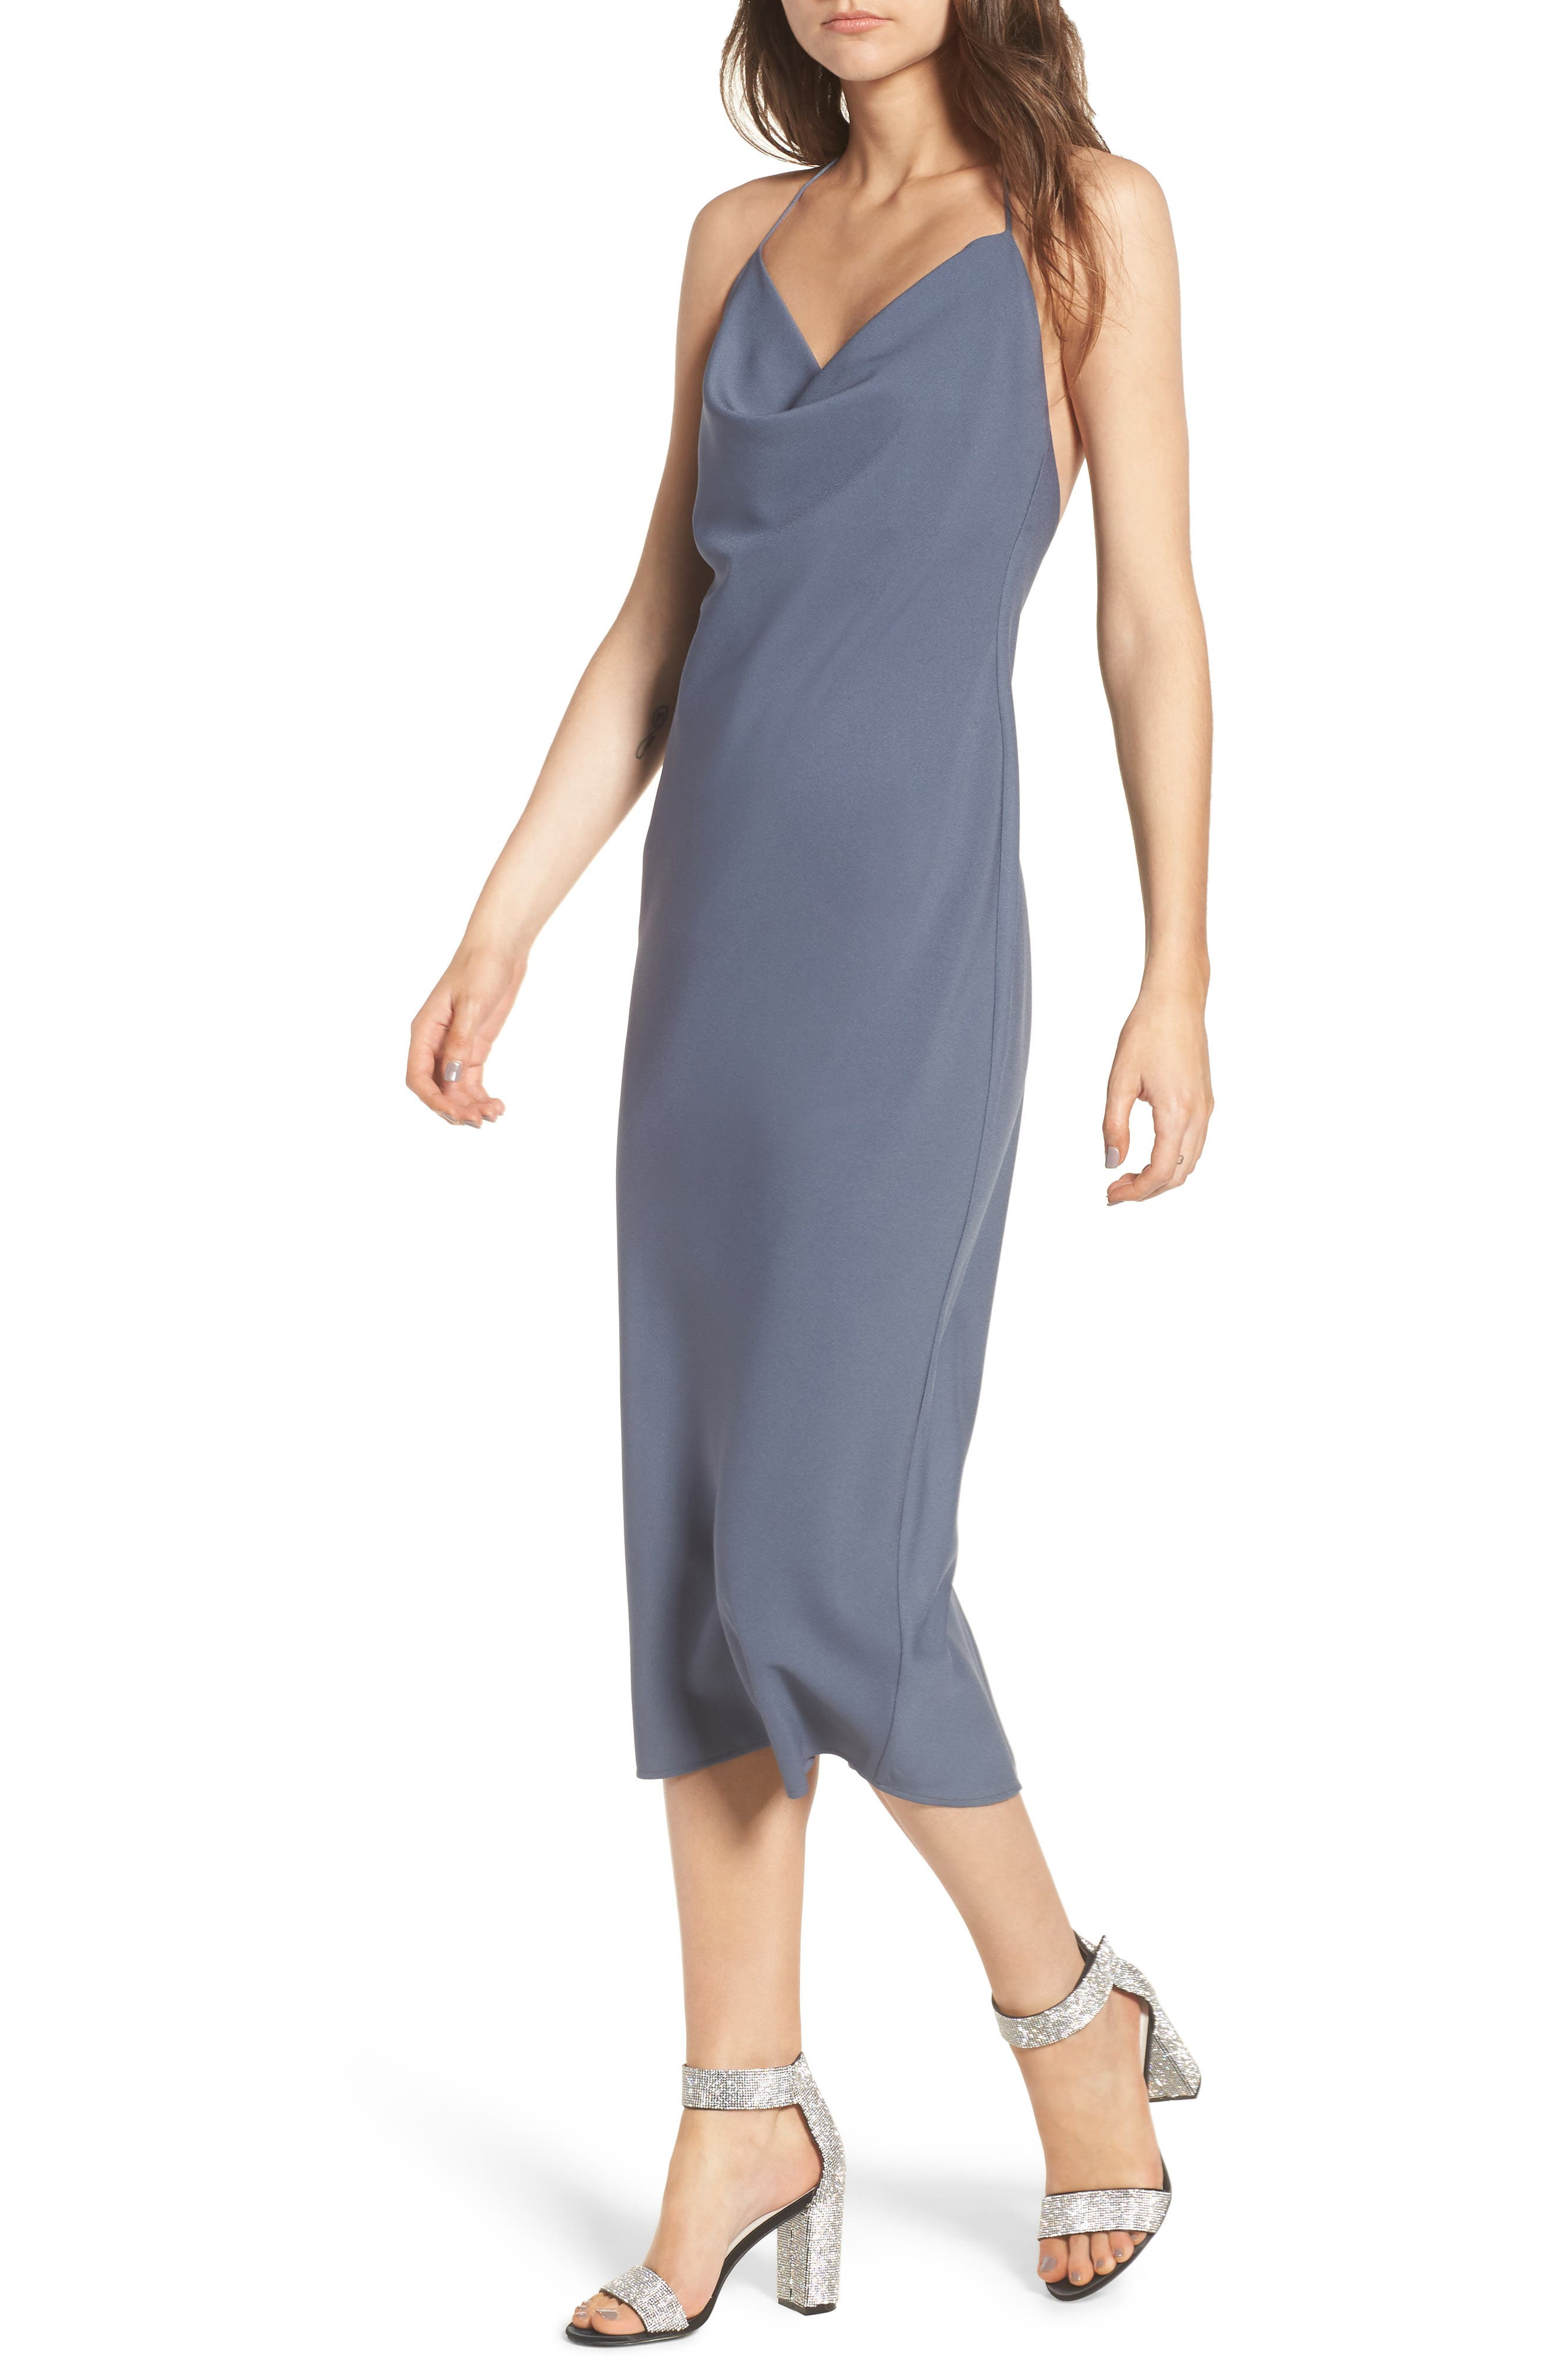 Cowl Neck Midi Dress,                             Main thumbnail 1, color,                             Grey Grisaille